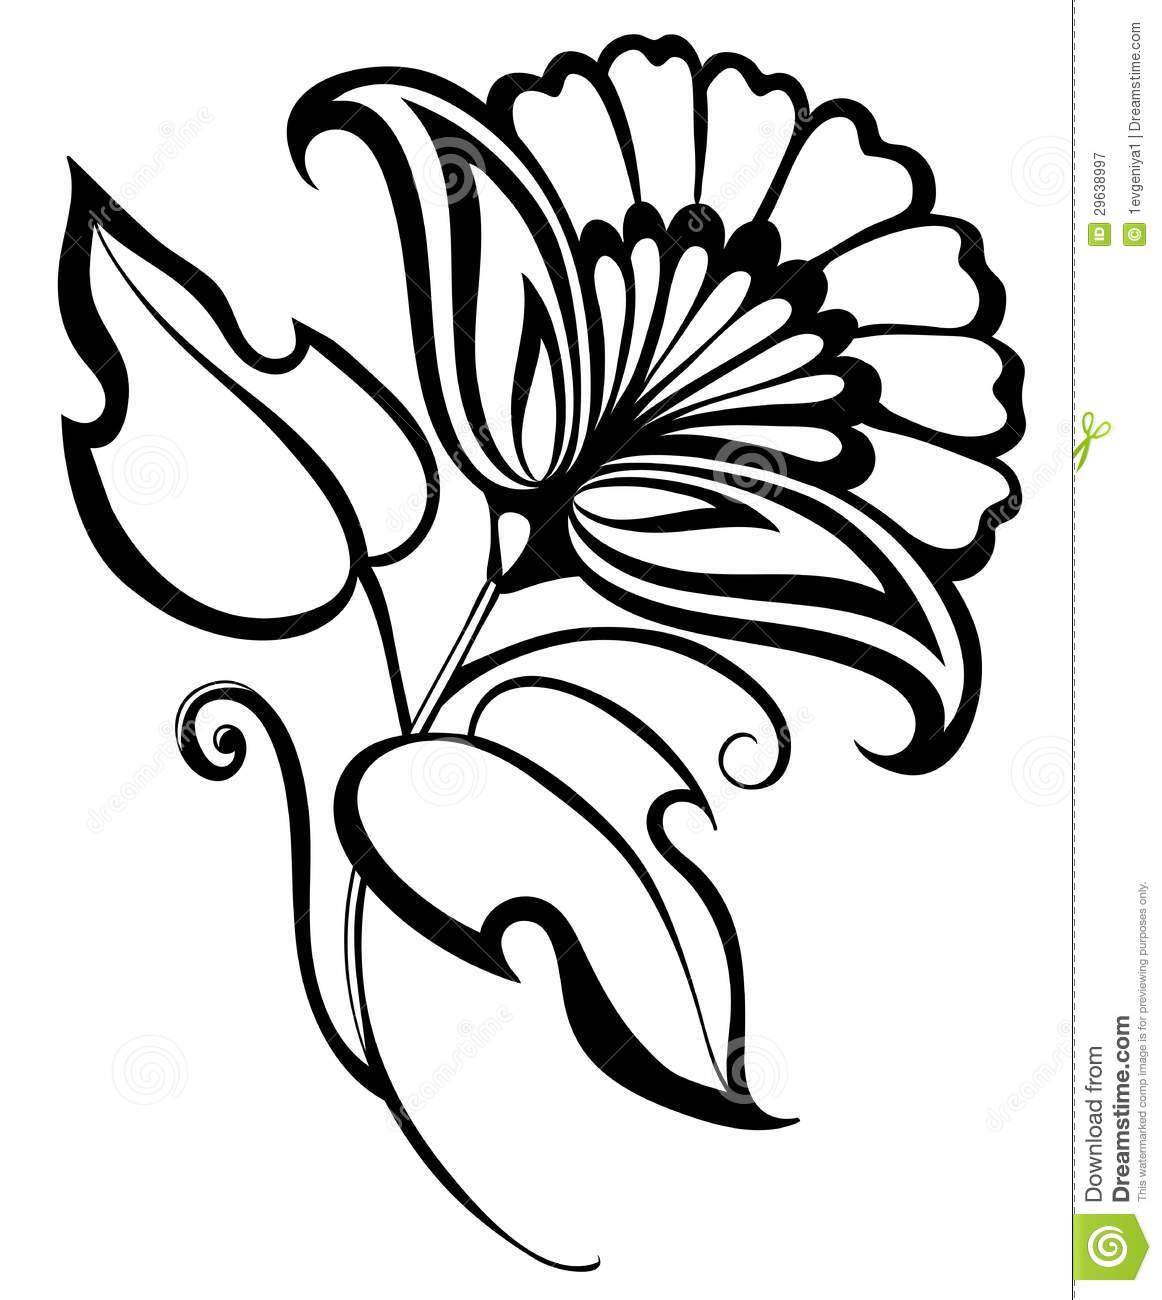 1162x1300 Flower Design Drawings